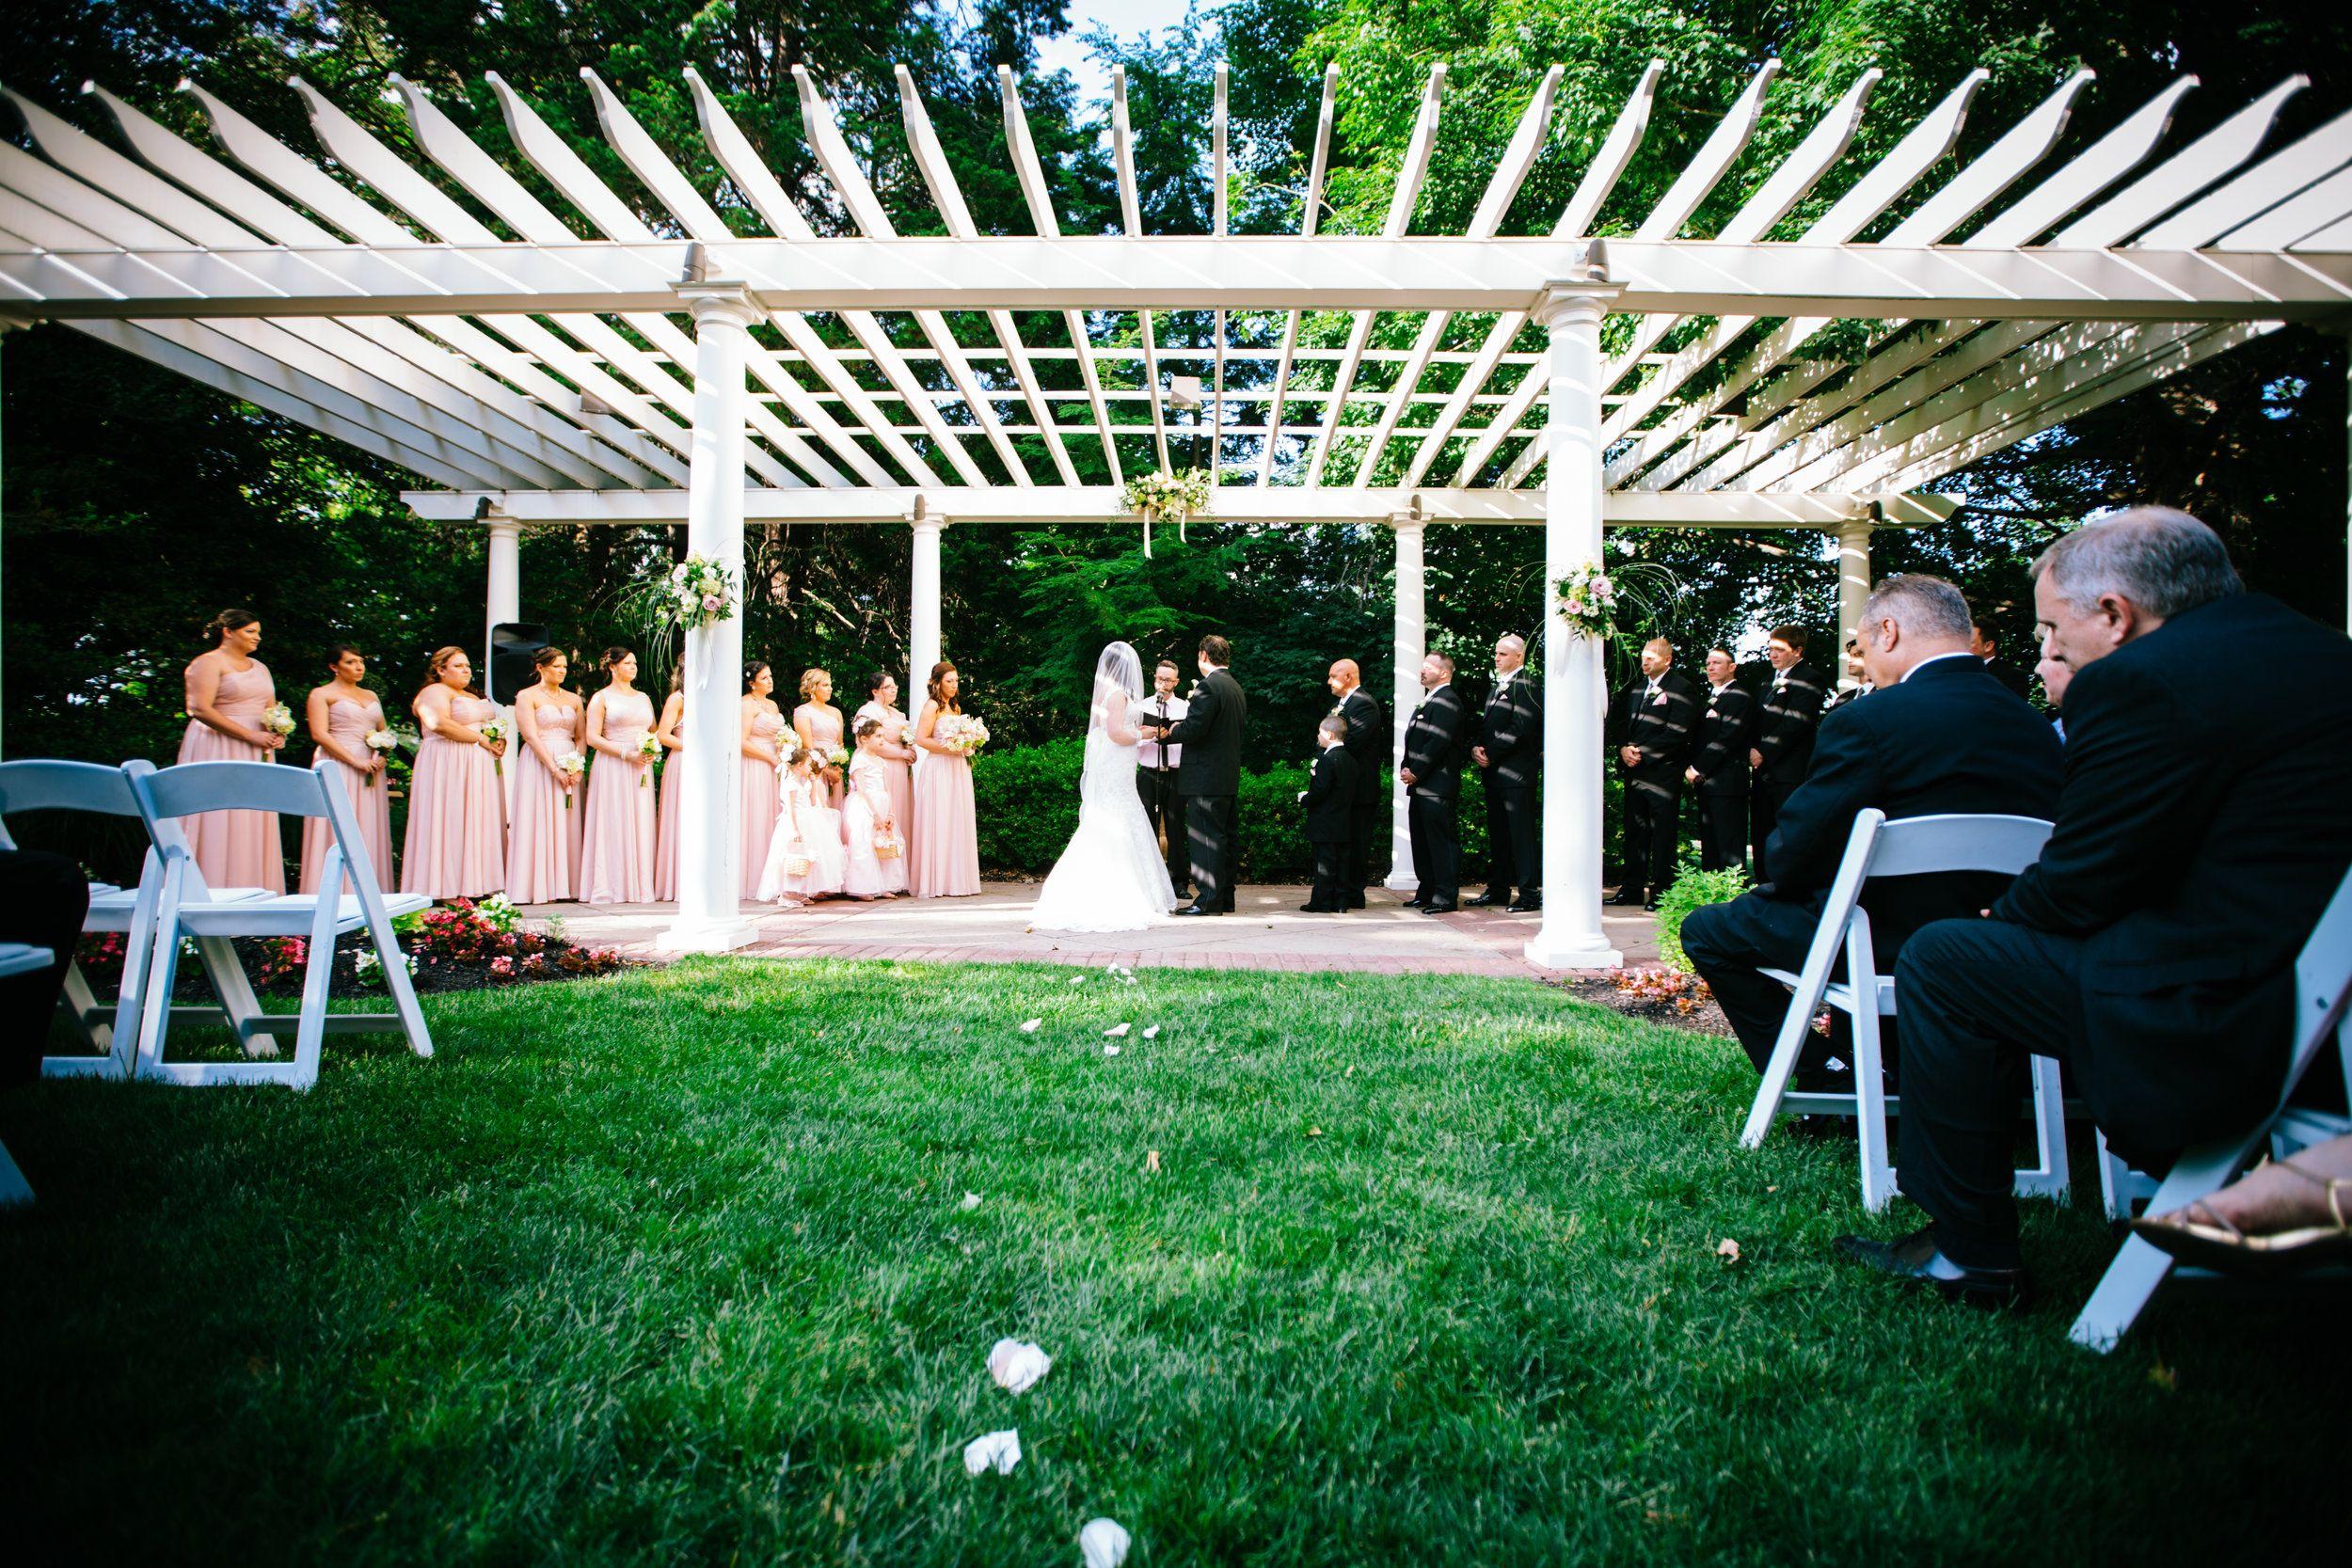 Philadelphia based wedding photographer, who enjoys the